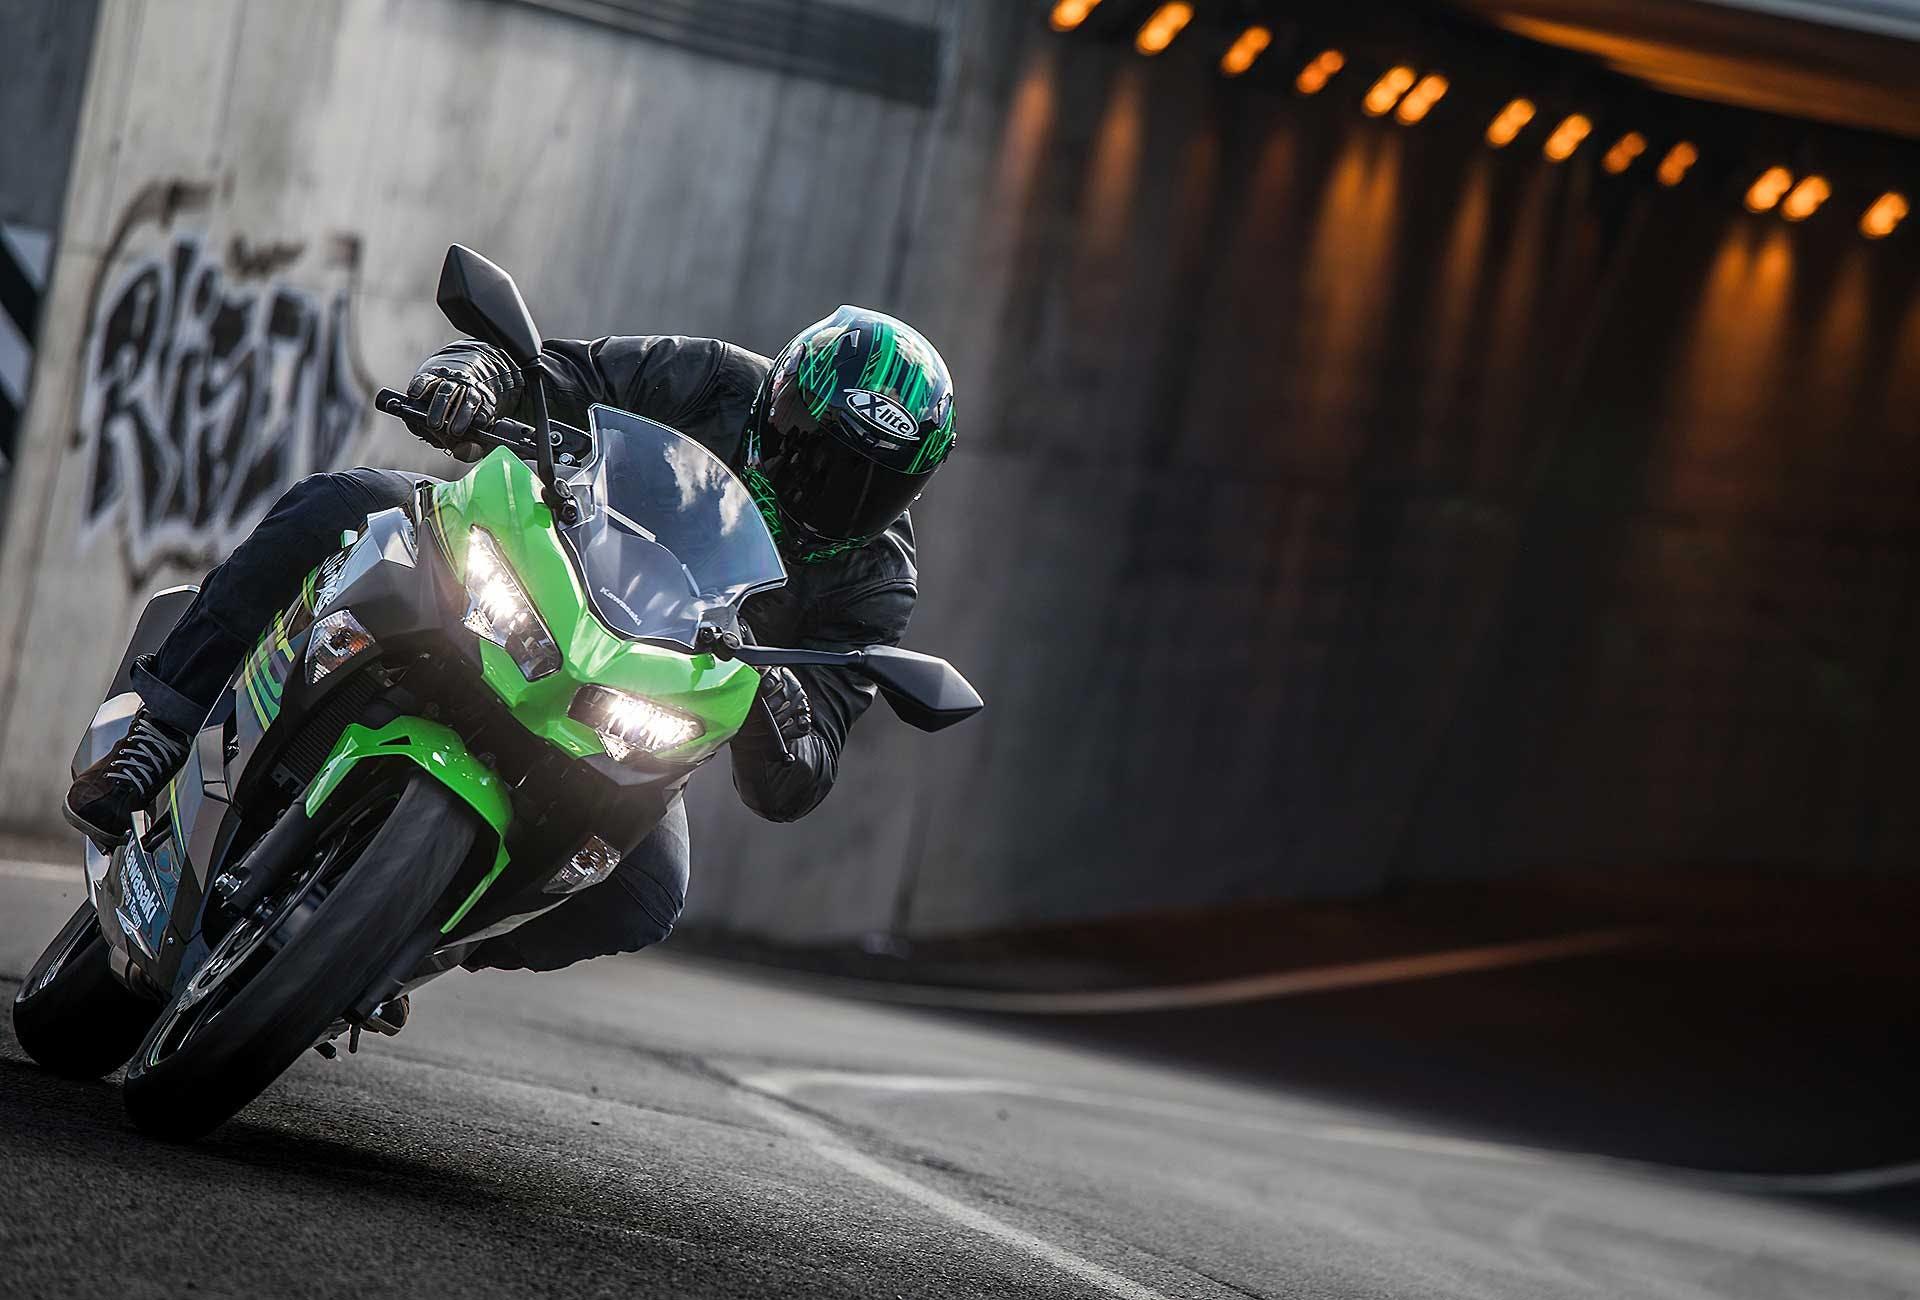 Kawasaki Ninja 400 verde movimento strada